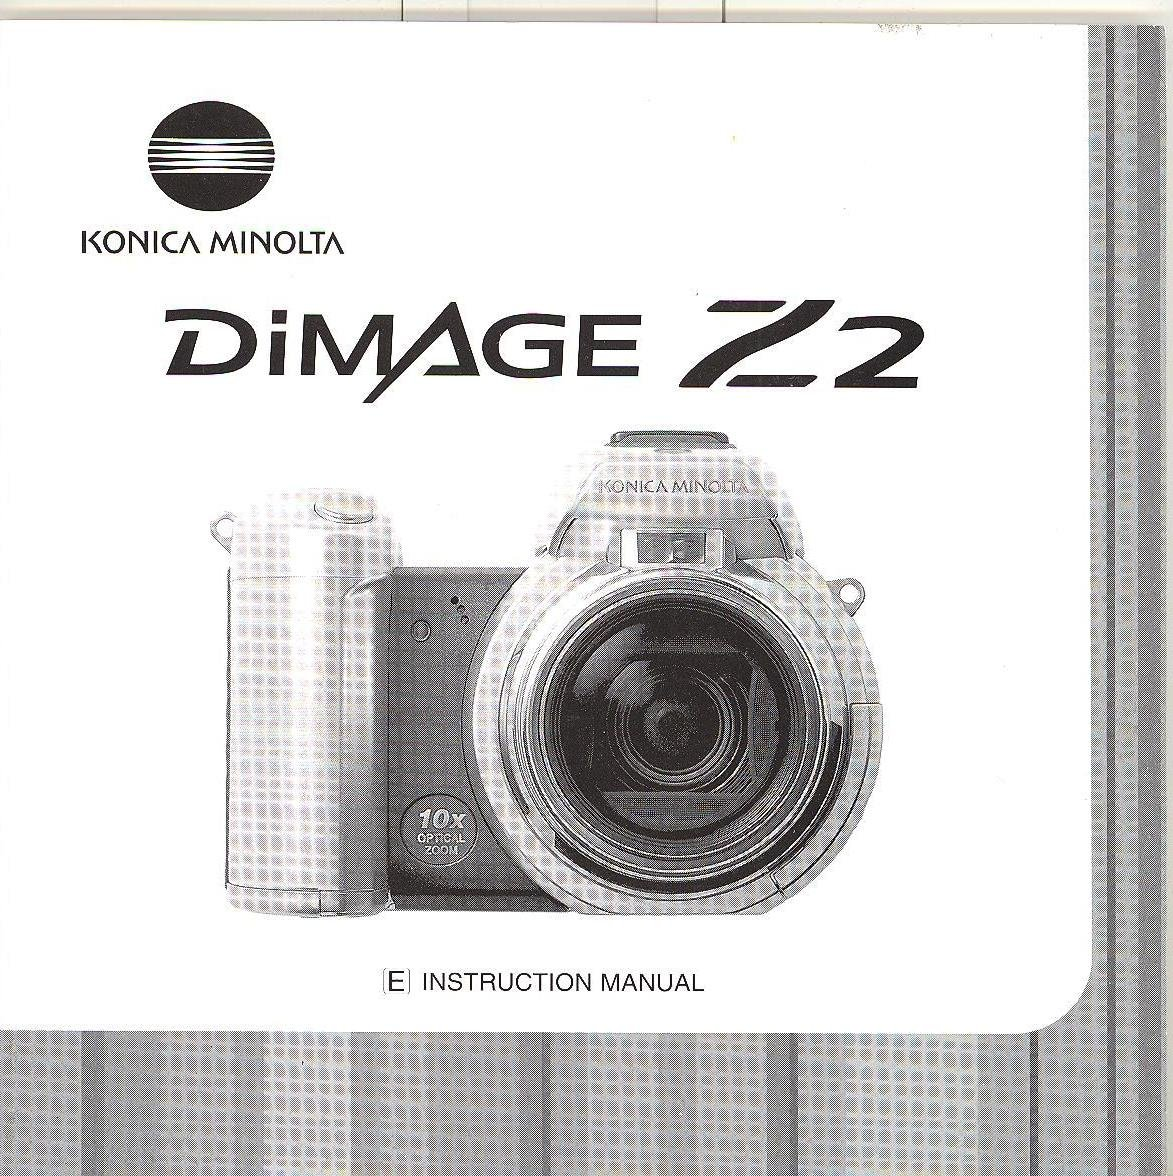 Konica Minolta DiMage Z2 Original Instruction Manual: Amazon